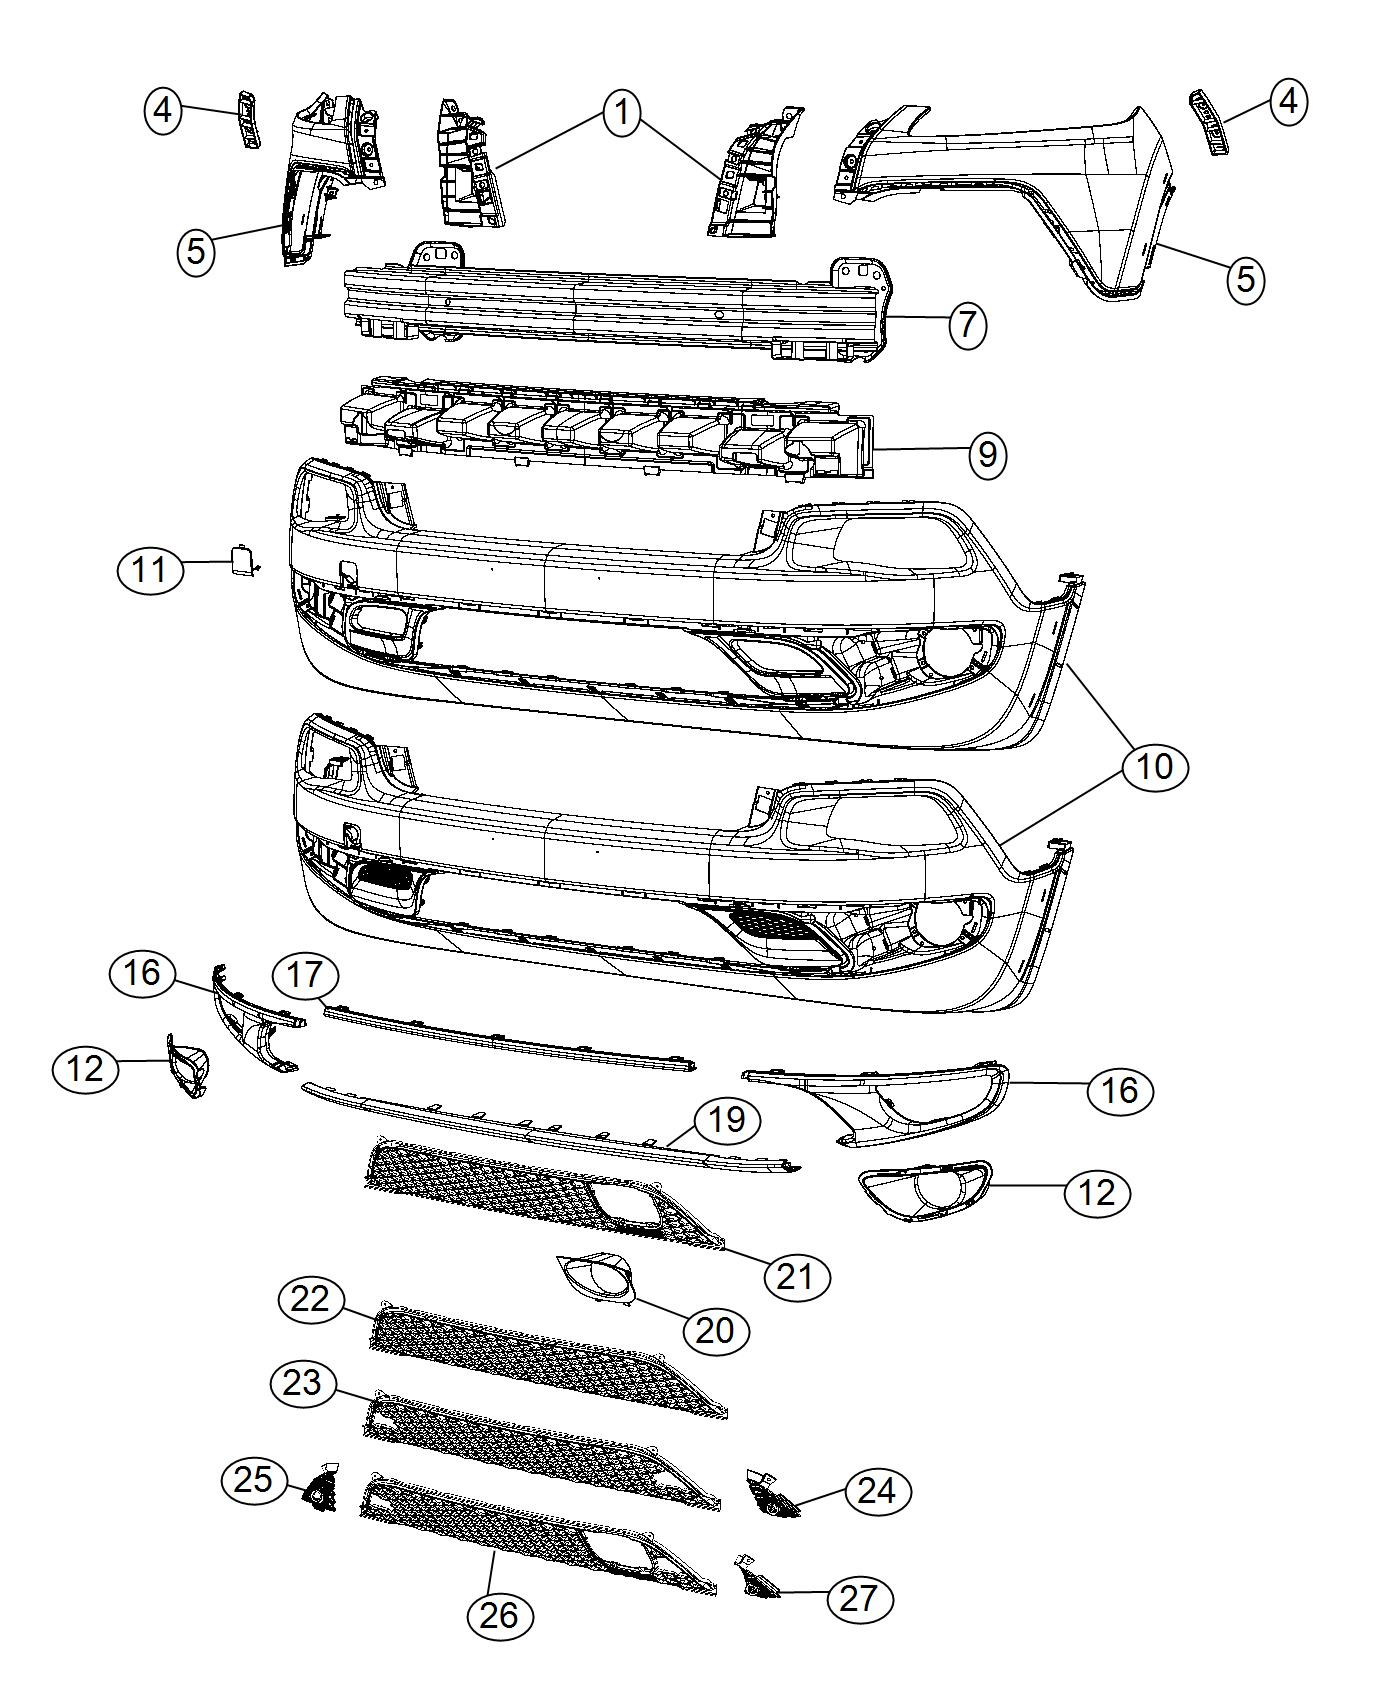 2015 Jeep Cherokee Fascia. Front lower. [x8w], [xew], [mmz